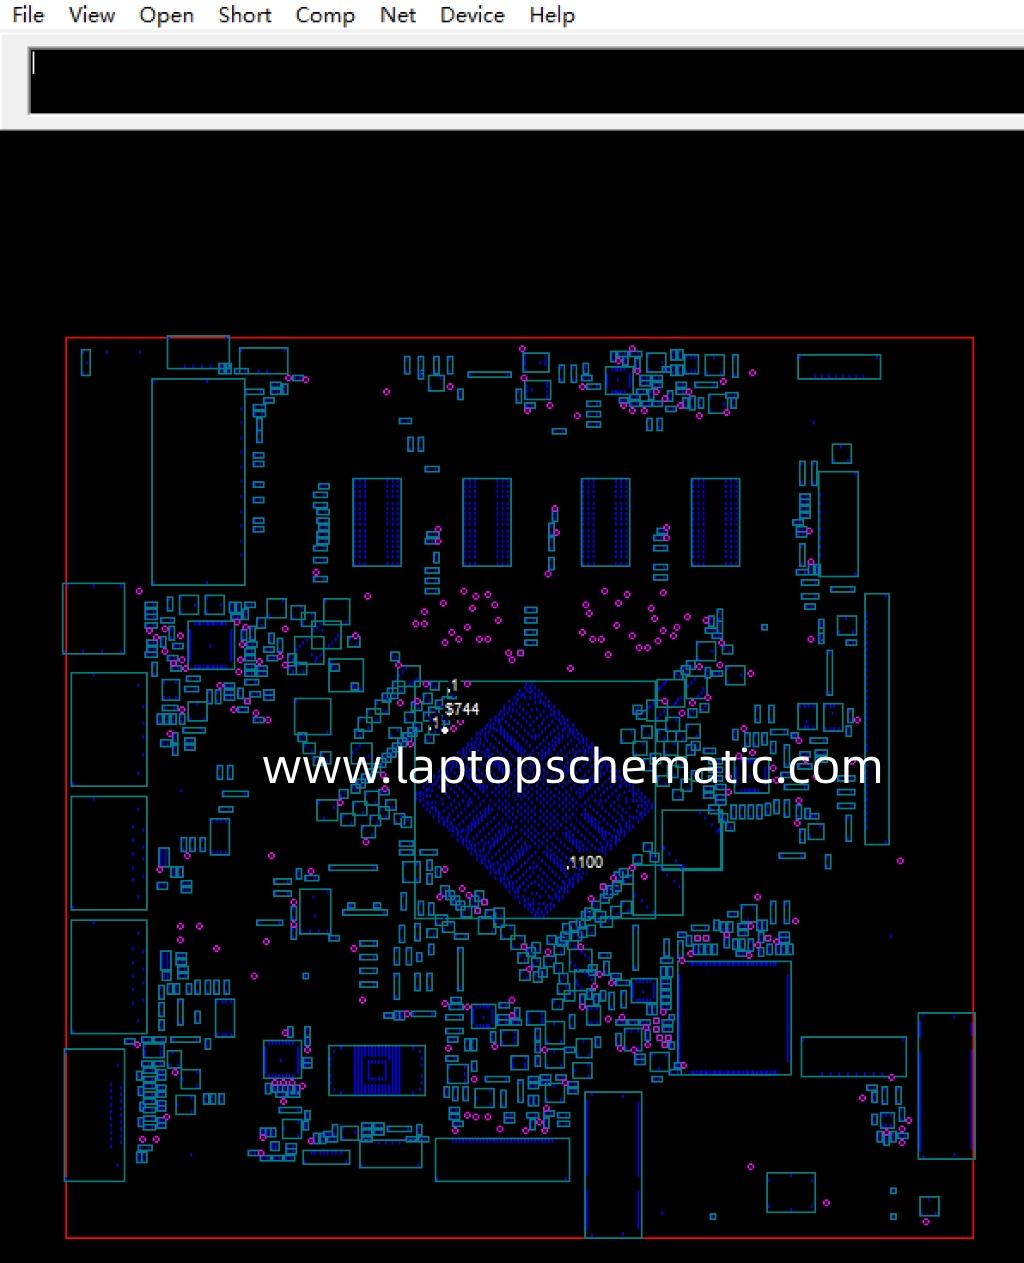 HP-Stream-14-ax010wm-DA0P9MB16D0-Boardview Quanta Project Schematic Diagram on sony tv, samsung lcd tv, am tube radio, hvac system, computer circuit board, digital multimeter,